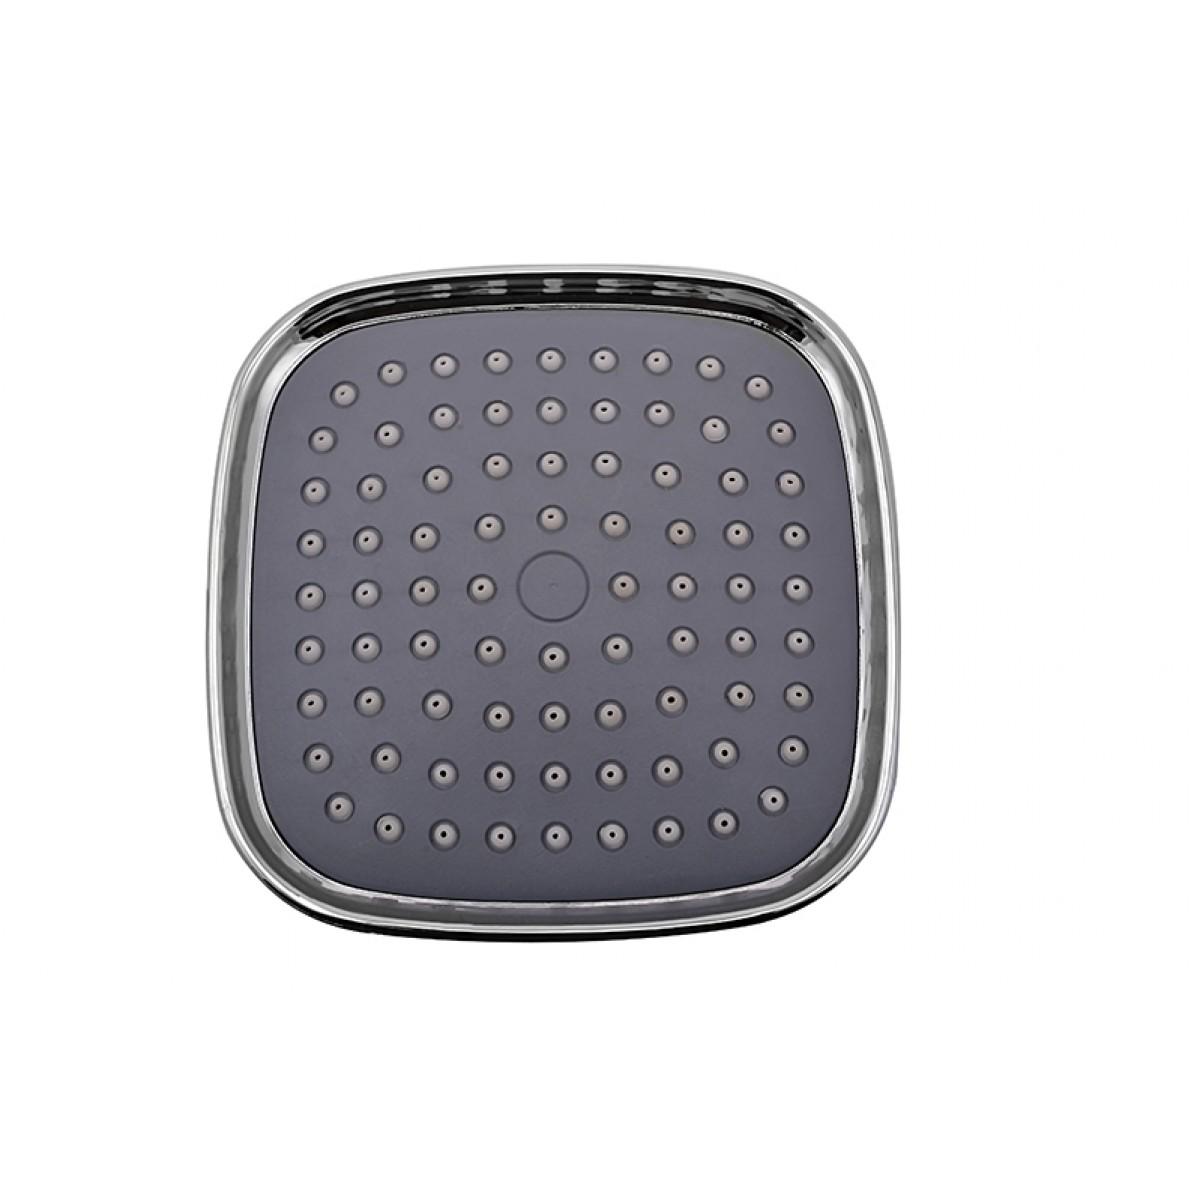 Buy Online Bathroom Shower Head - ABS Shower Head - 15x4x5 - Ruby - Toy